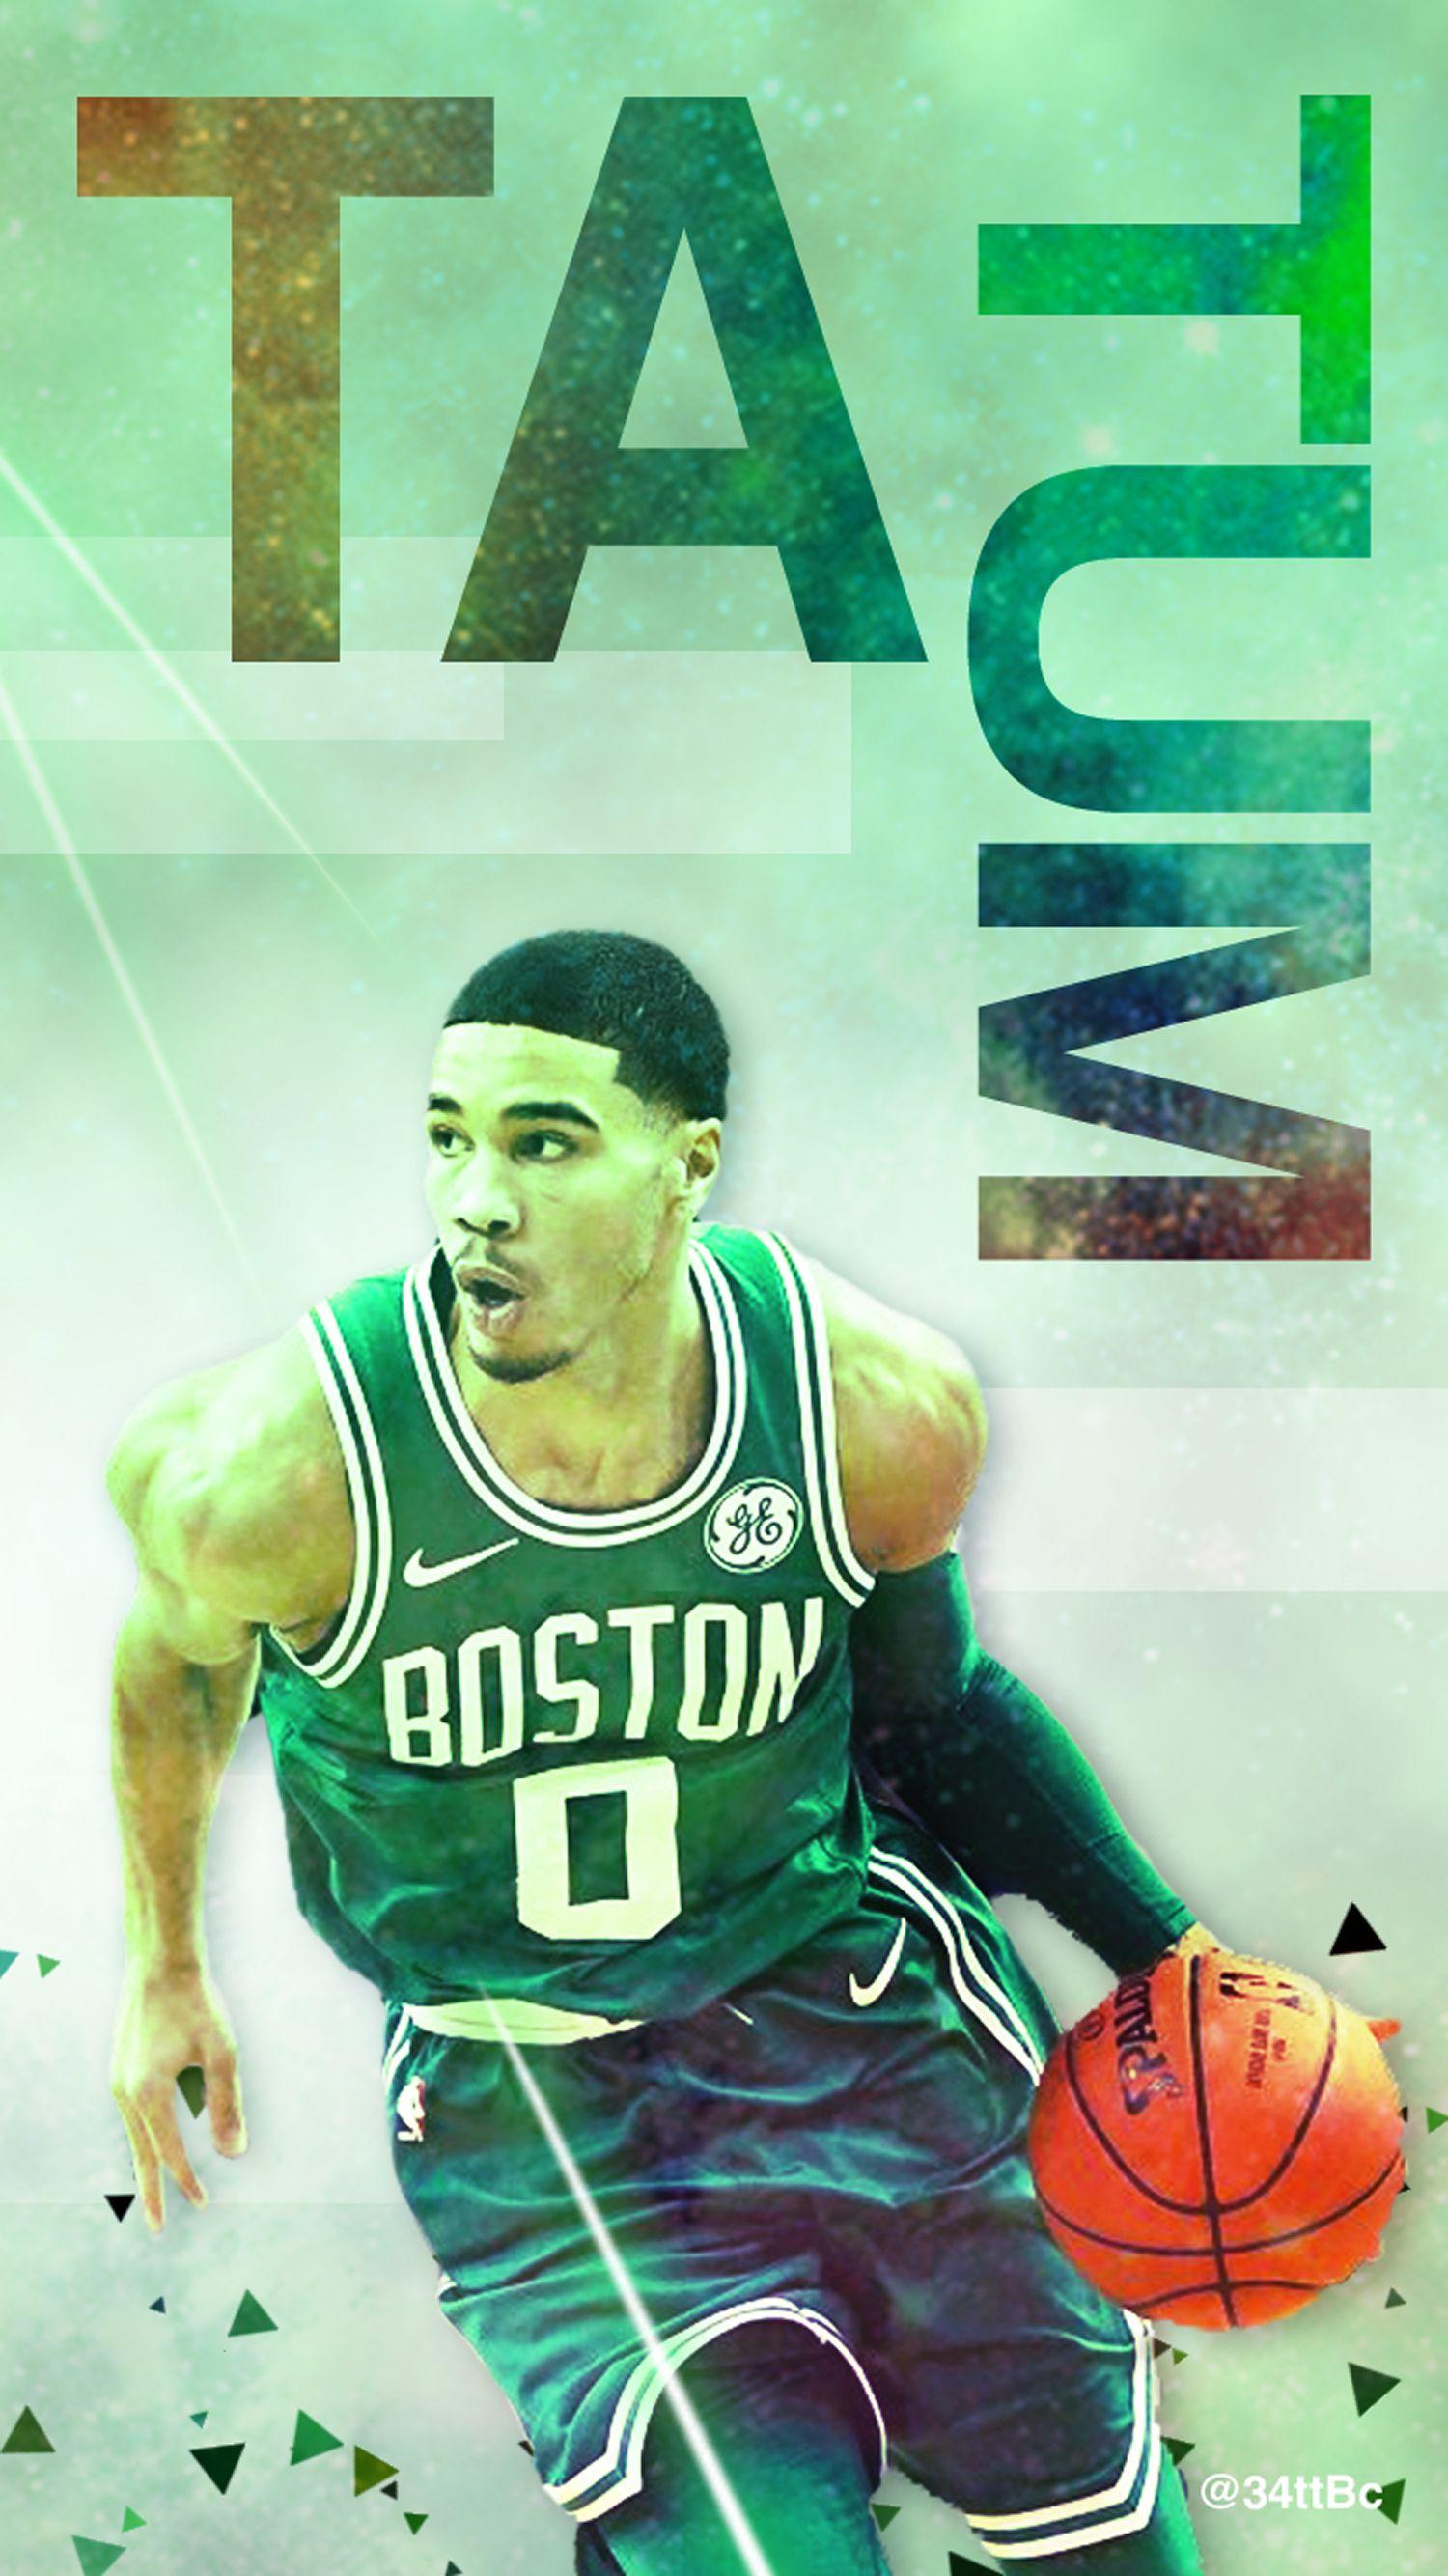 Boston Celtics F Tatum Wallpaper Boston Celtics Jayson Tatum Tatum